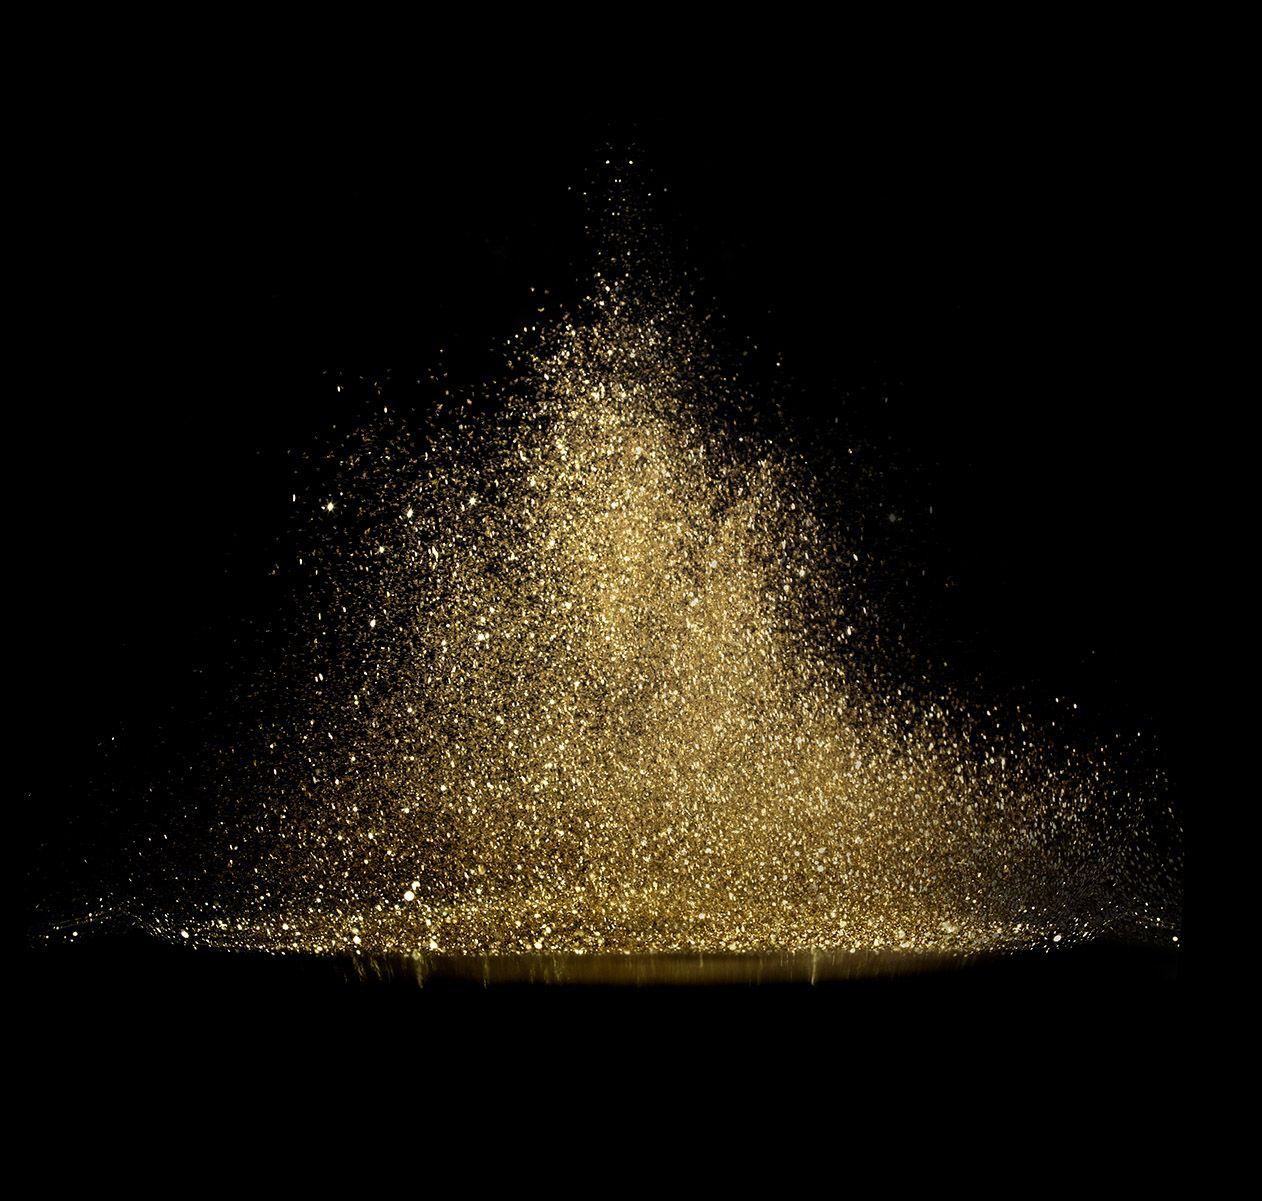 Black Iphone Wallpaper: Poudre Or Photo Www.olivier-placet.com